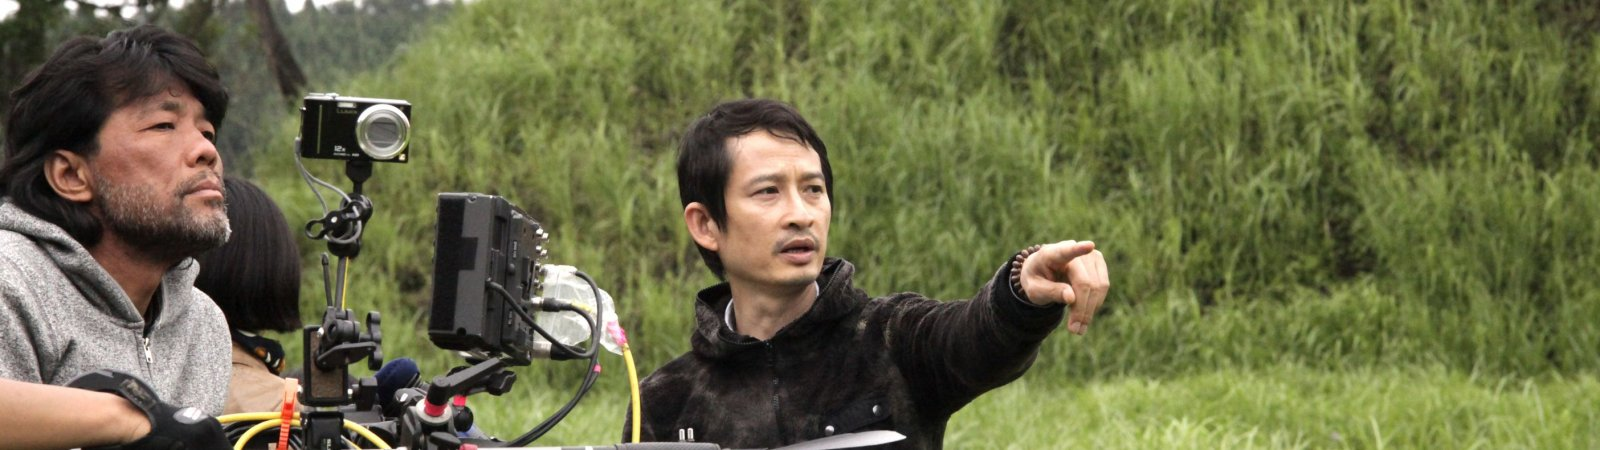 Photo dernier film Tran Anh Hung